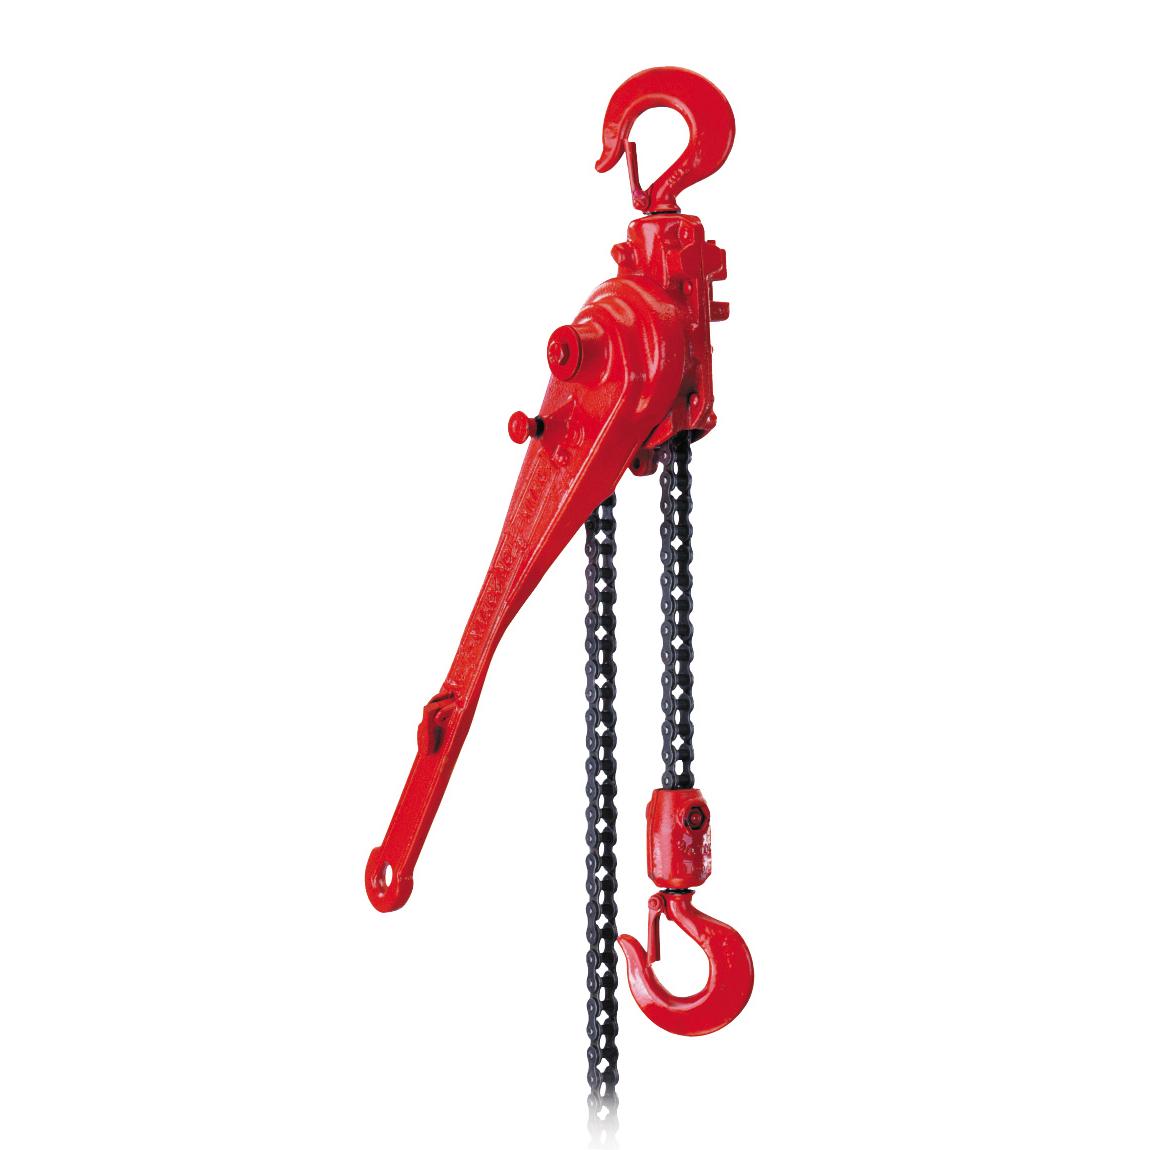 Coffing 2 ton hoist manual rheem 250l electric hot water system price